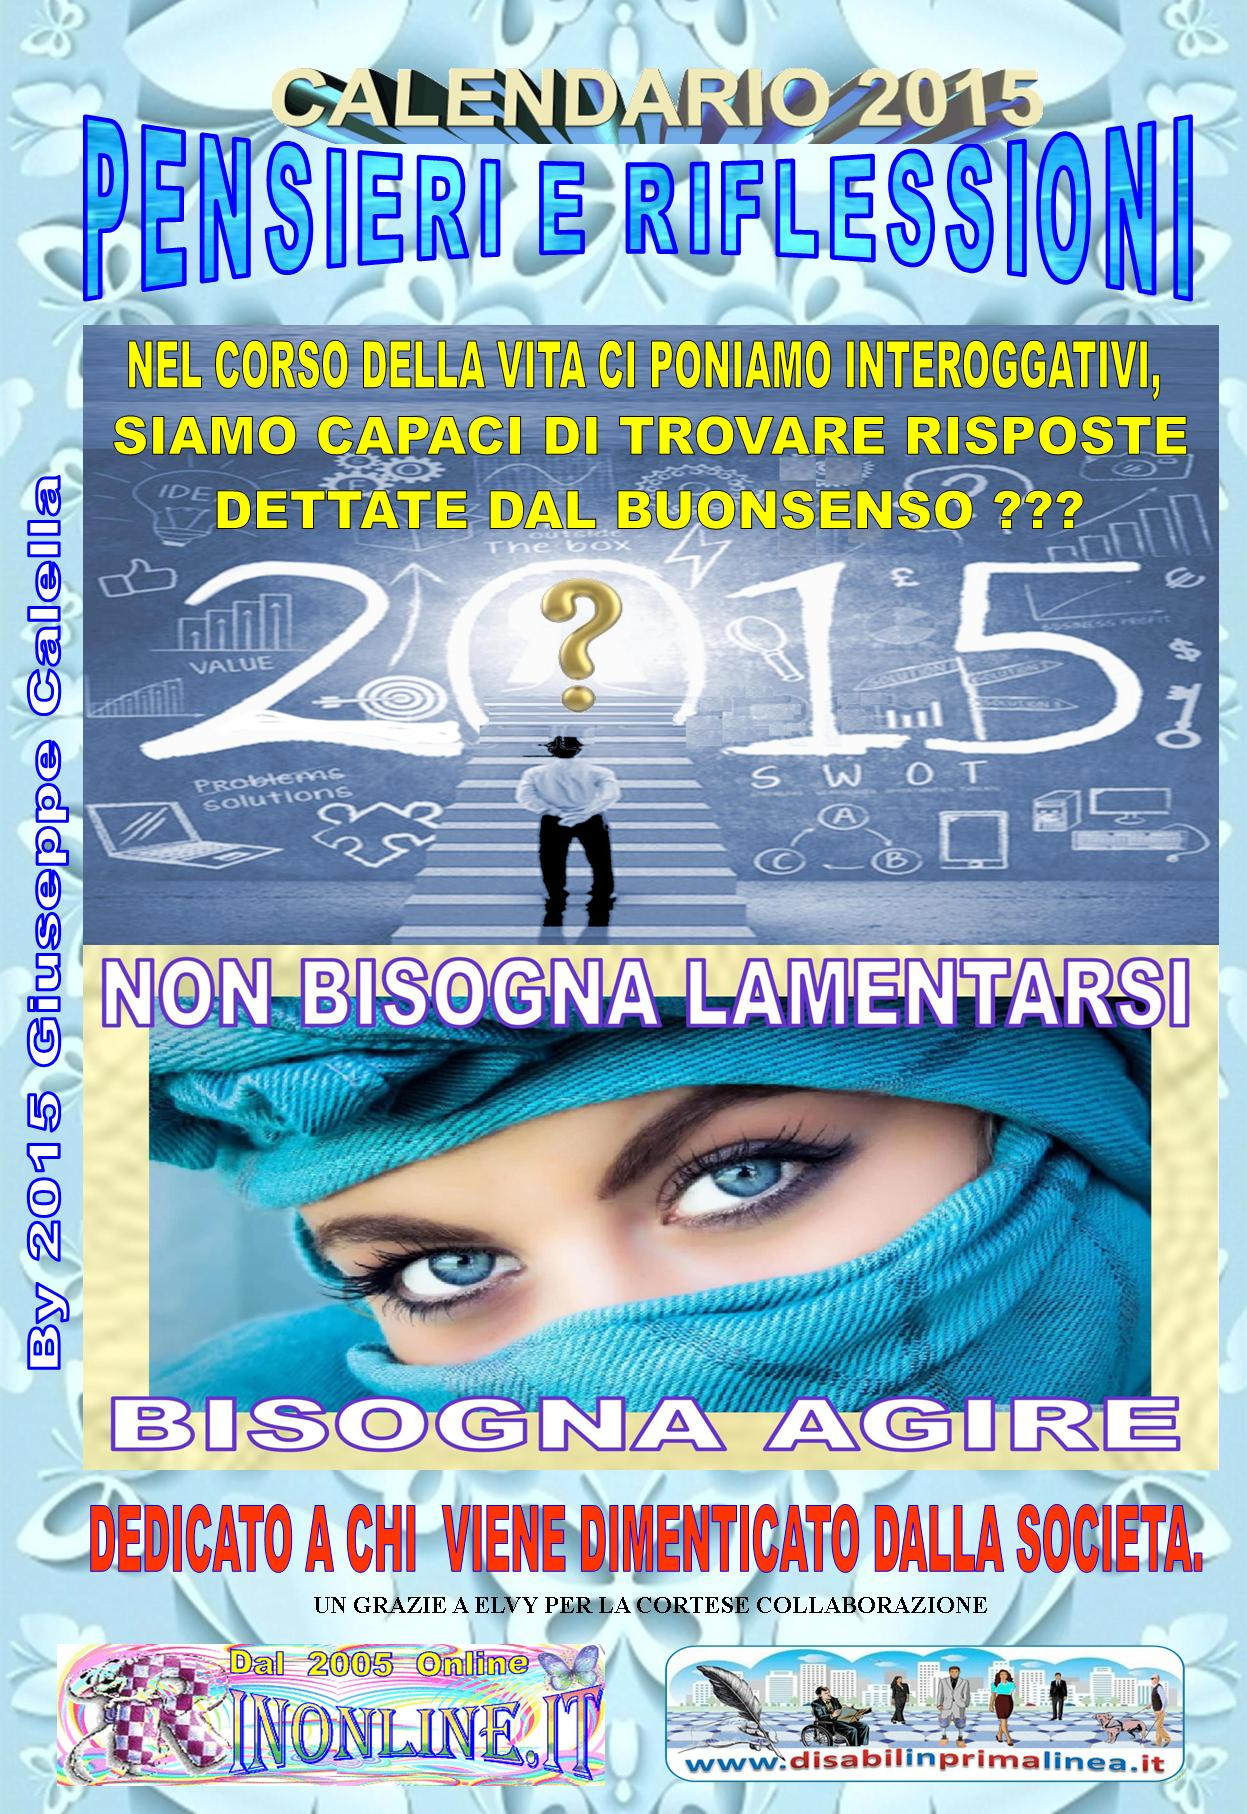 copertina_calendario_2015_pensieri_riflessioni_giuseppe_calella